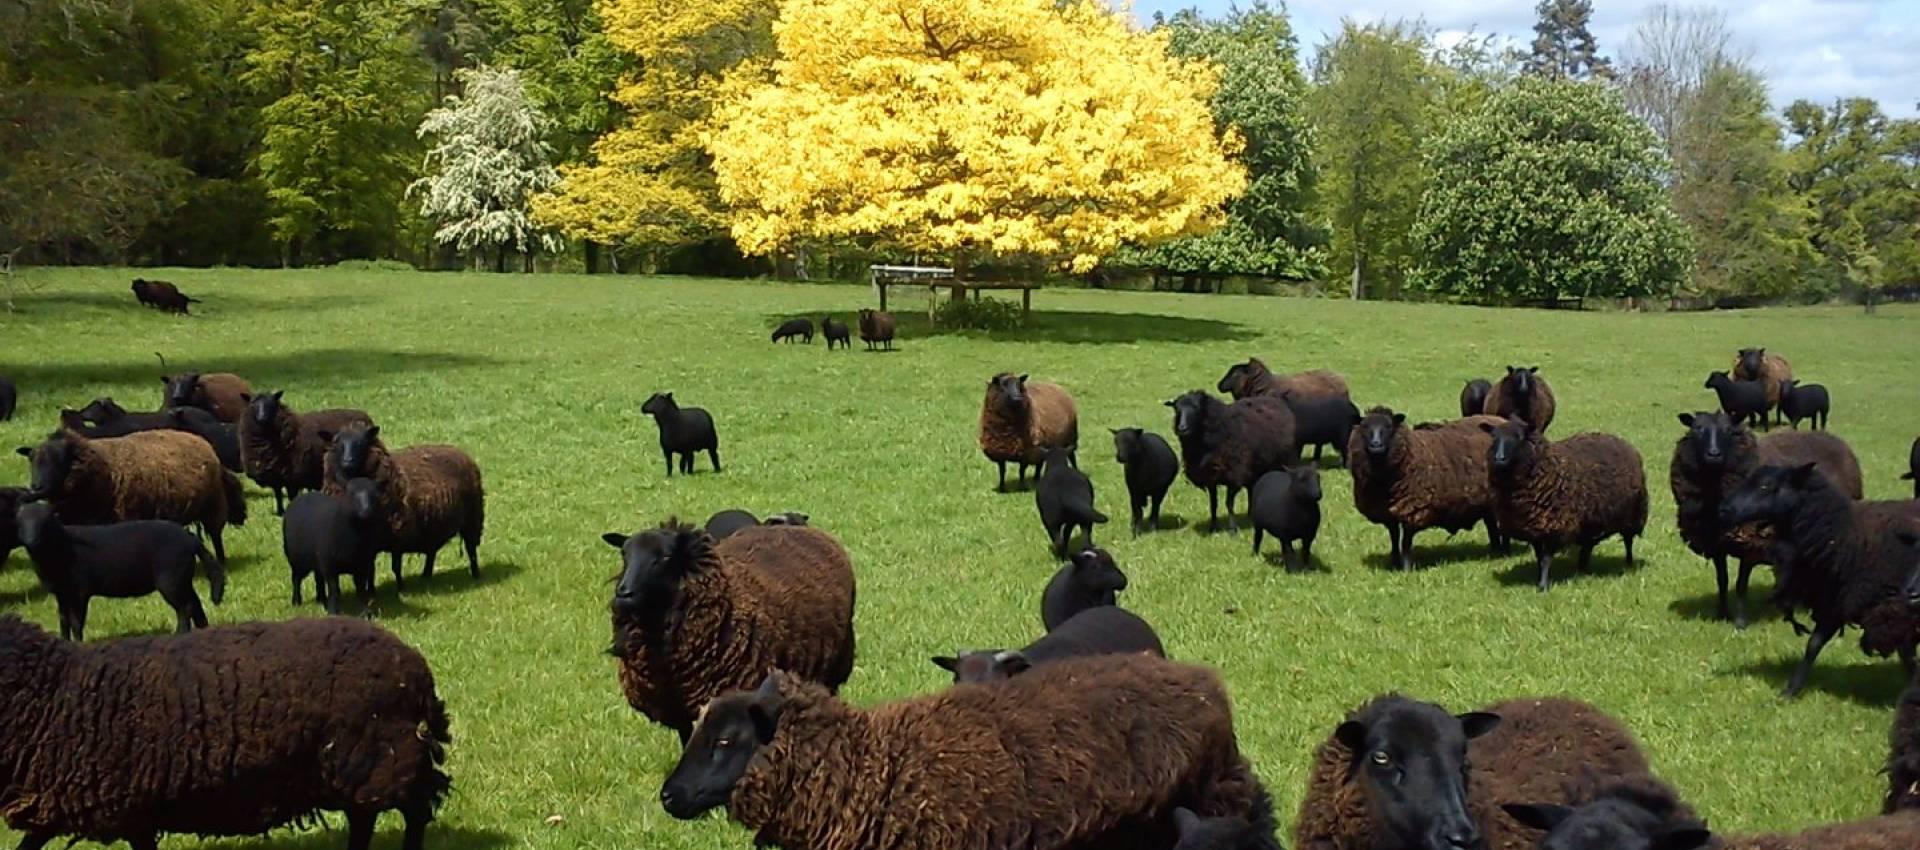 Black Welsh Mountain Sheep Breeders Association